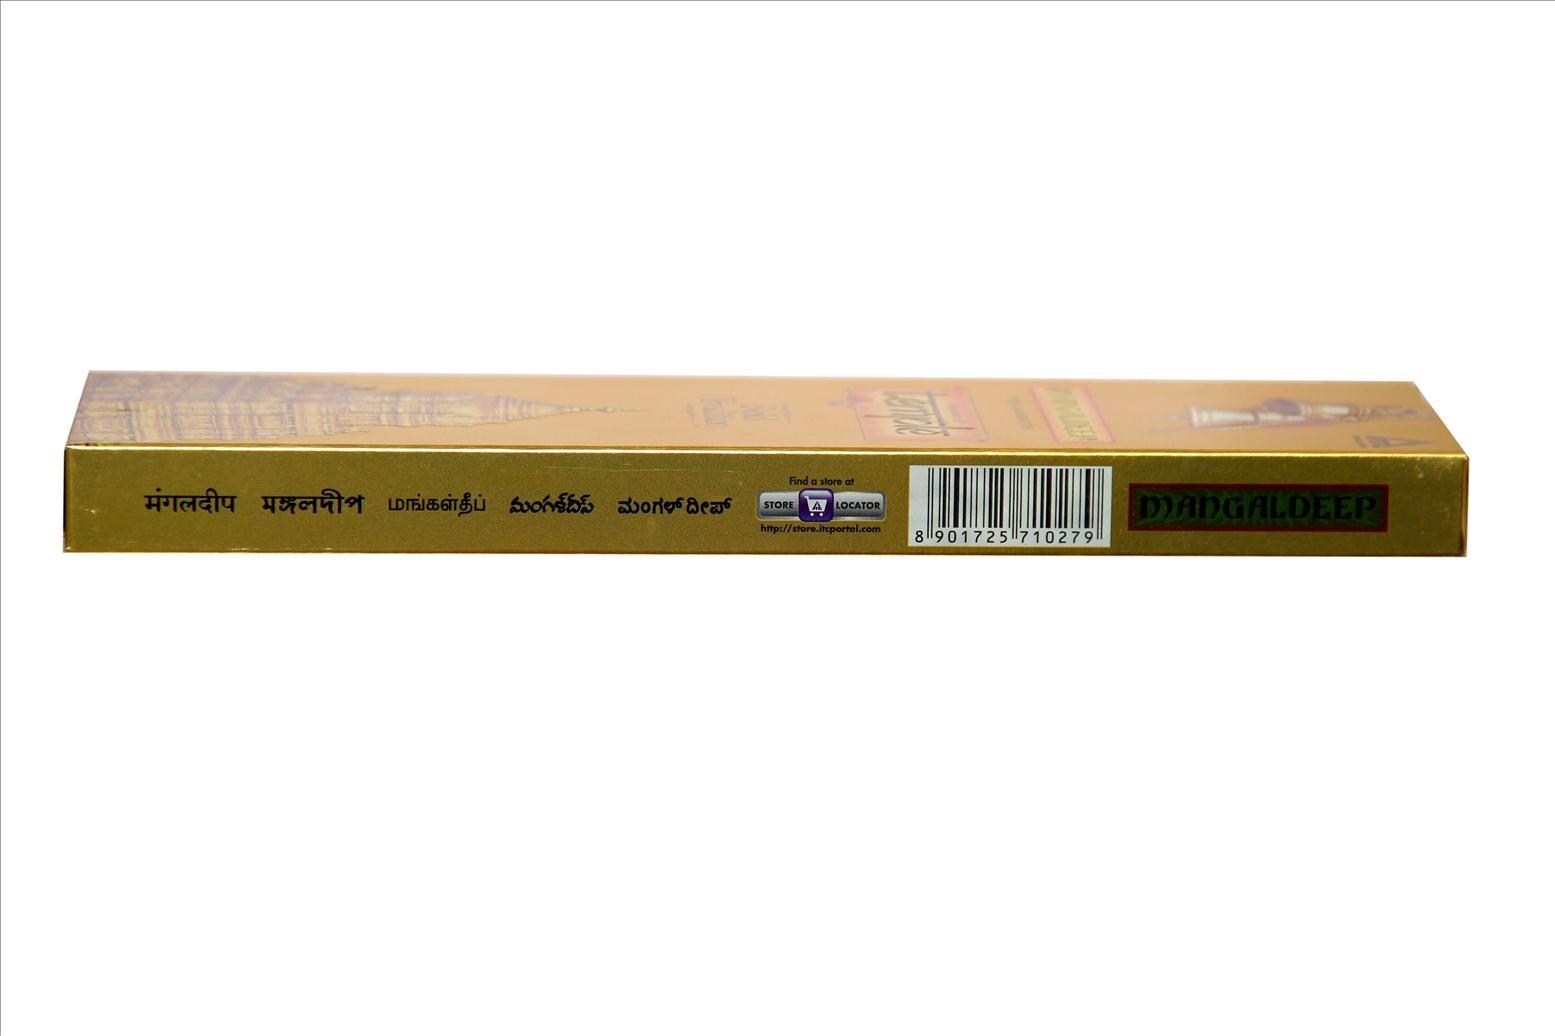 Mangaldeep Gold Tradition Puja Agarbattis 75 Gm